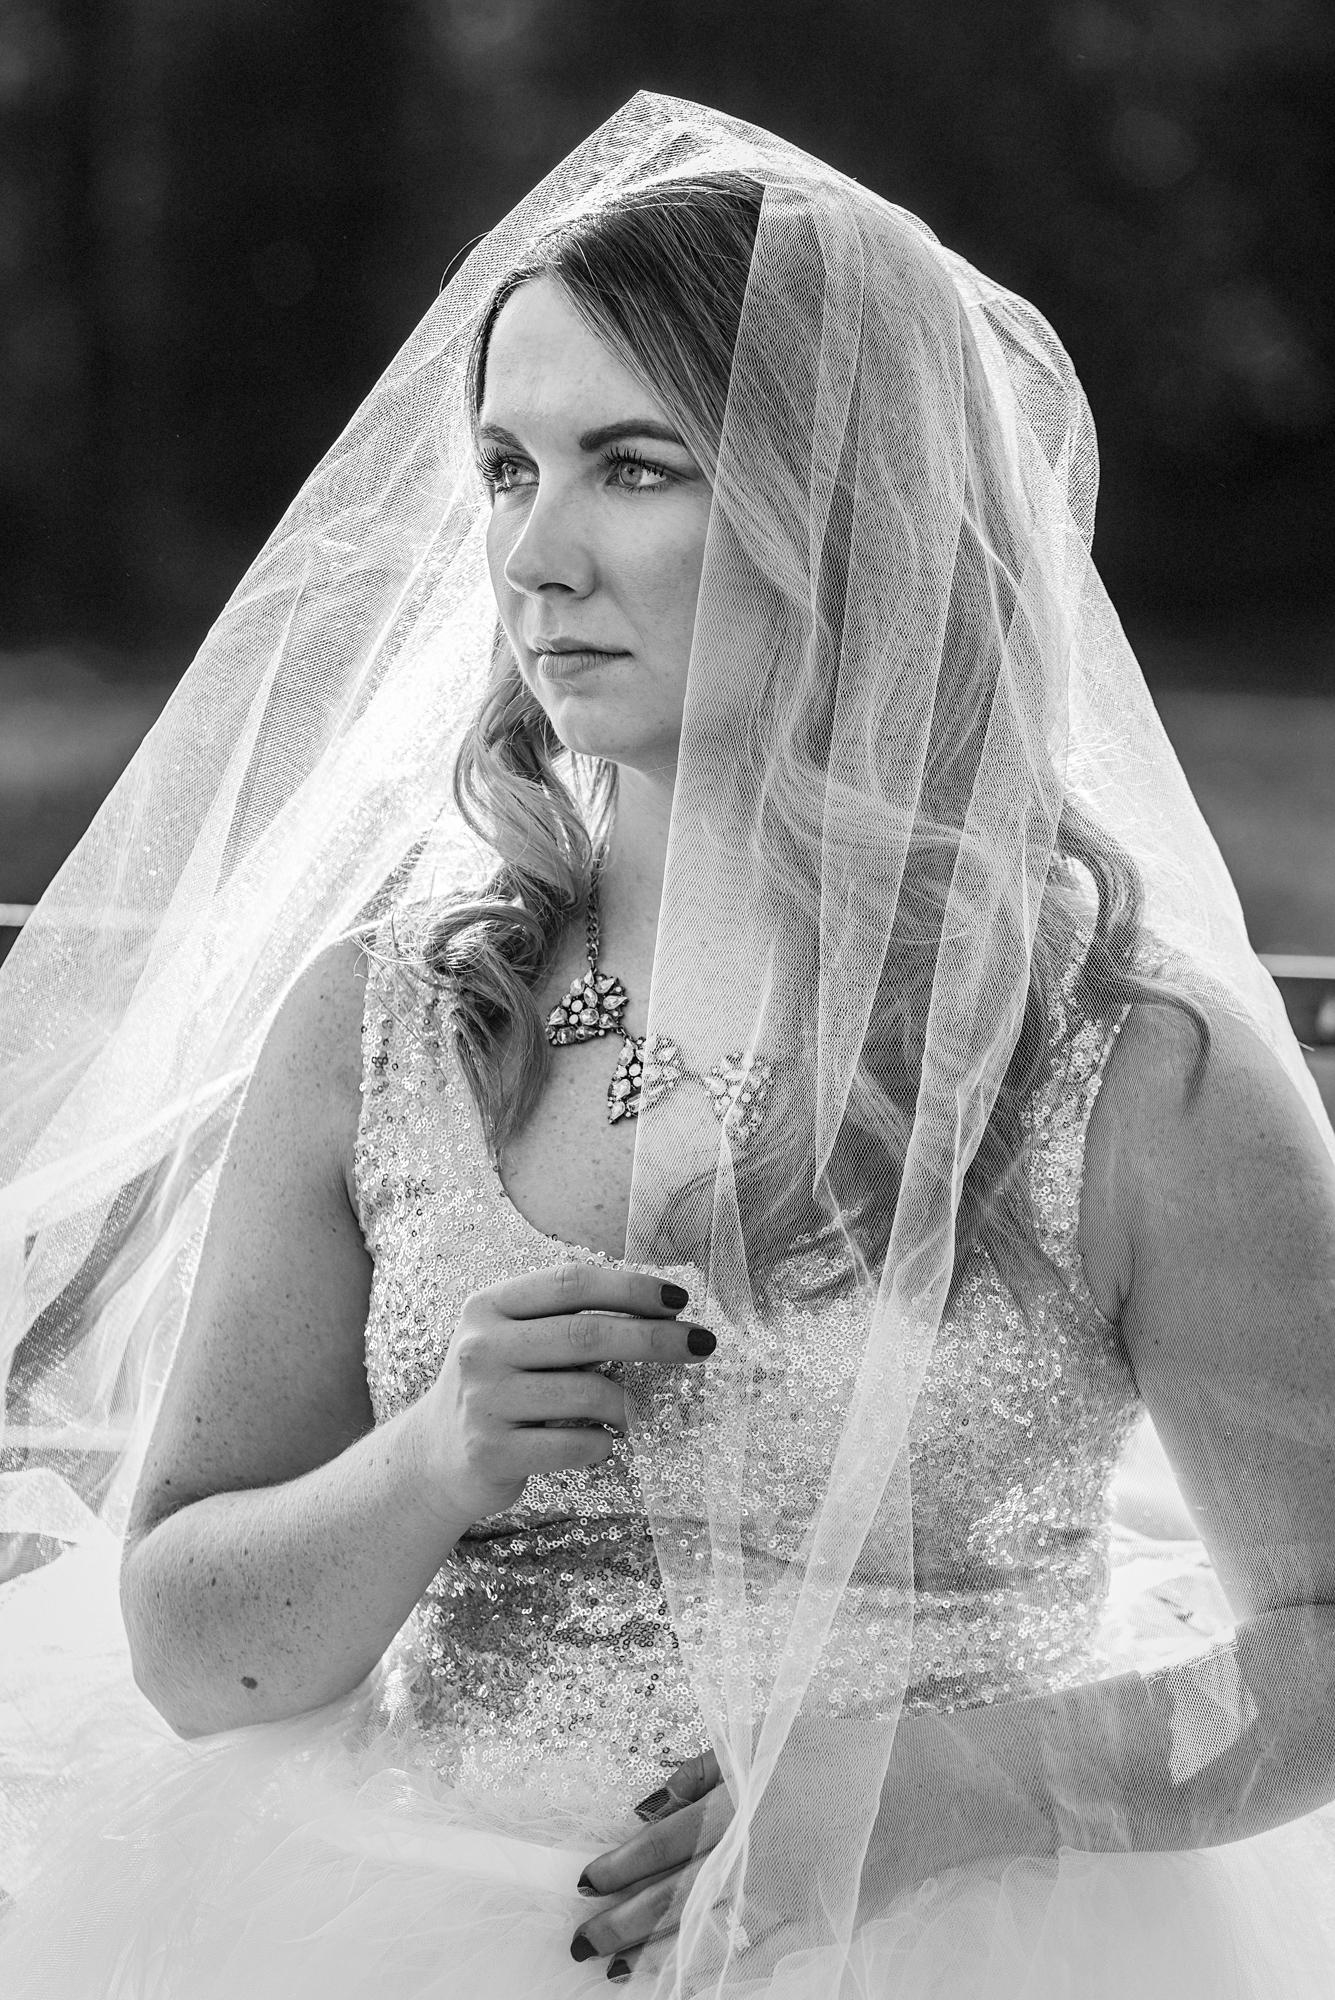 ENGAGEMENT PHOTOS   A Virginia Farm Engagement Session - Free Atkins Photography